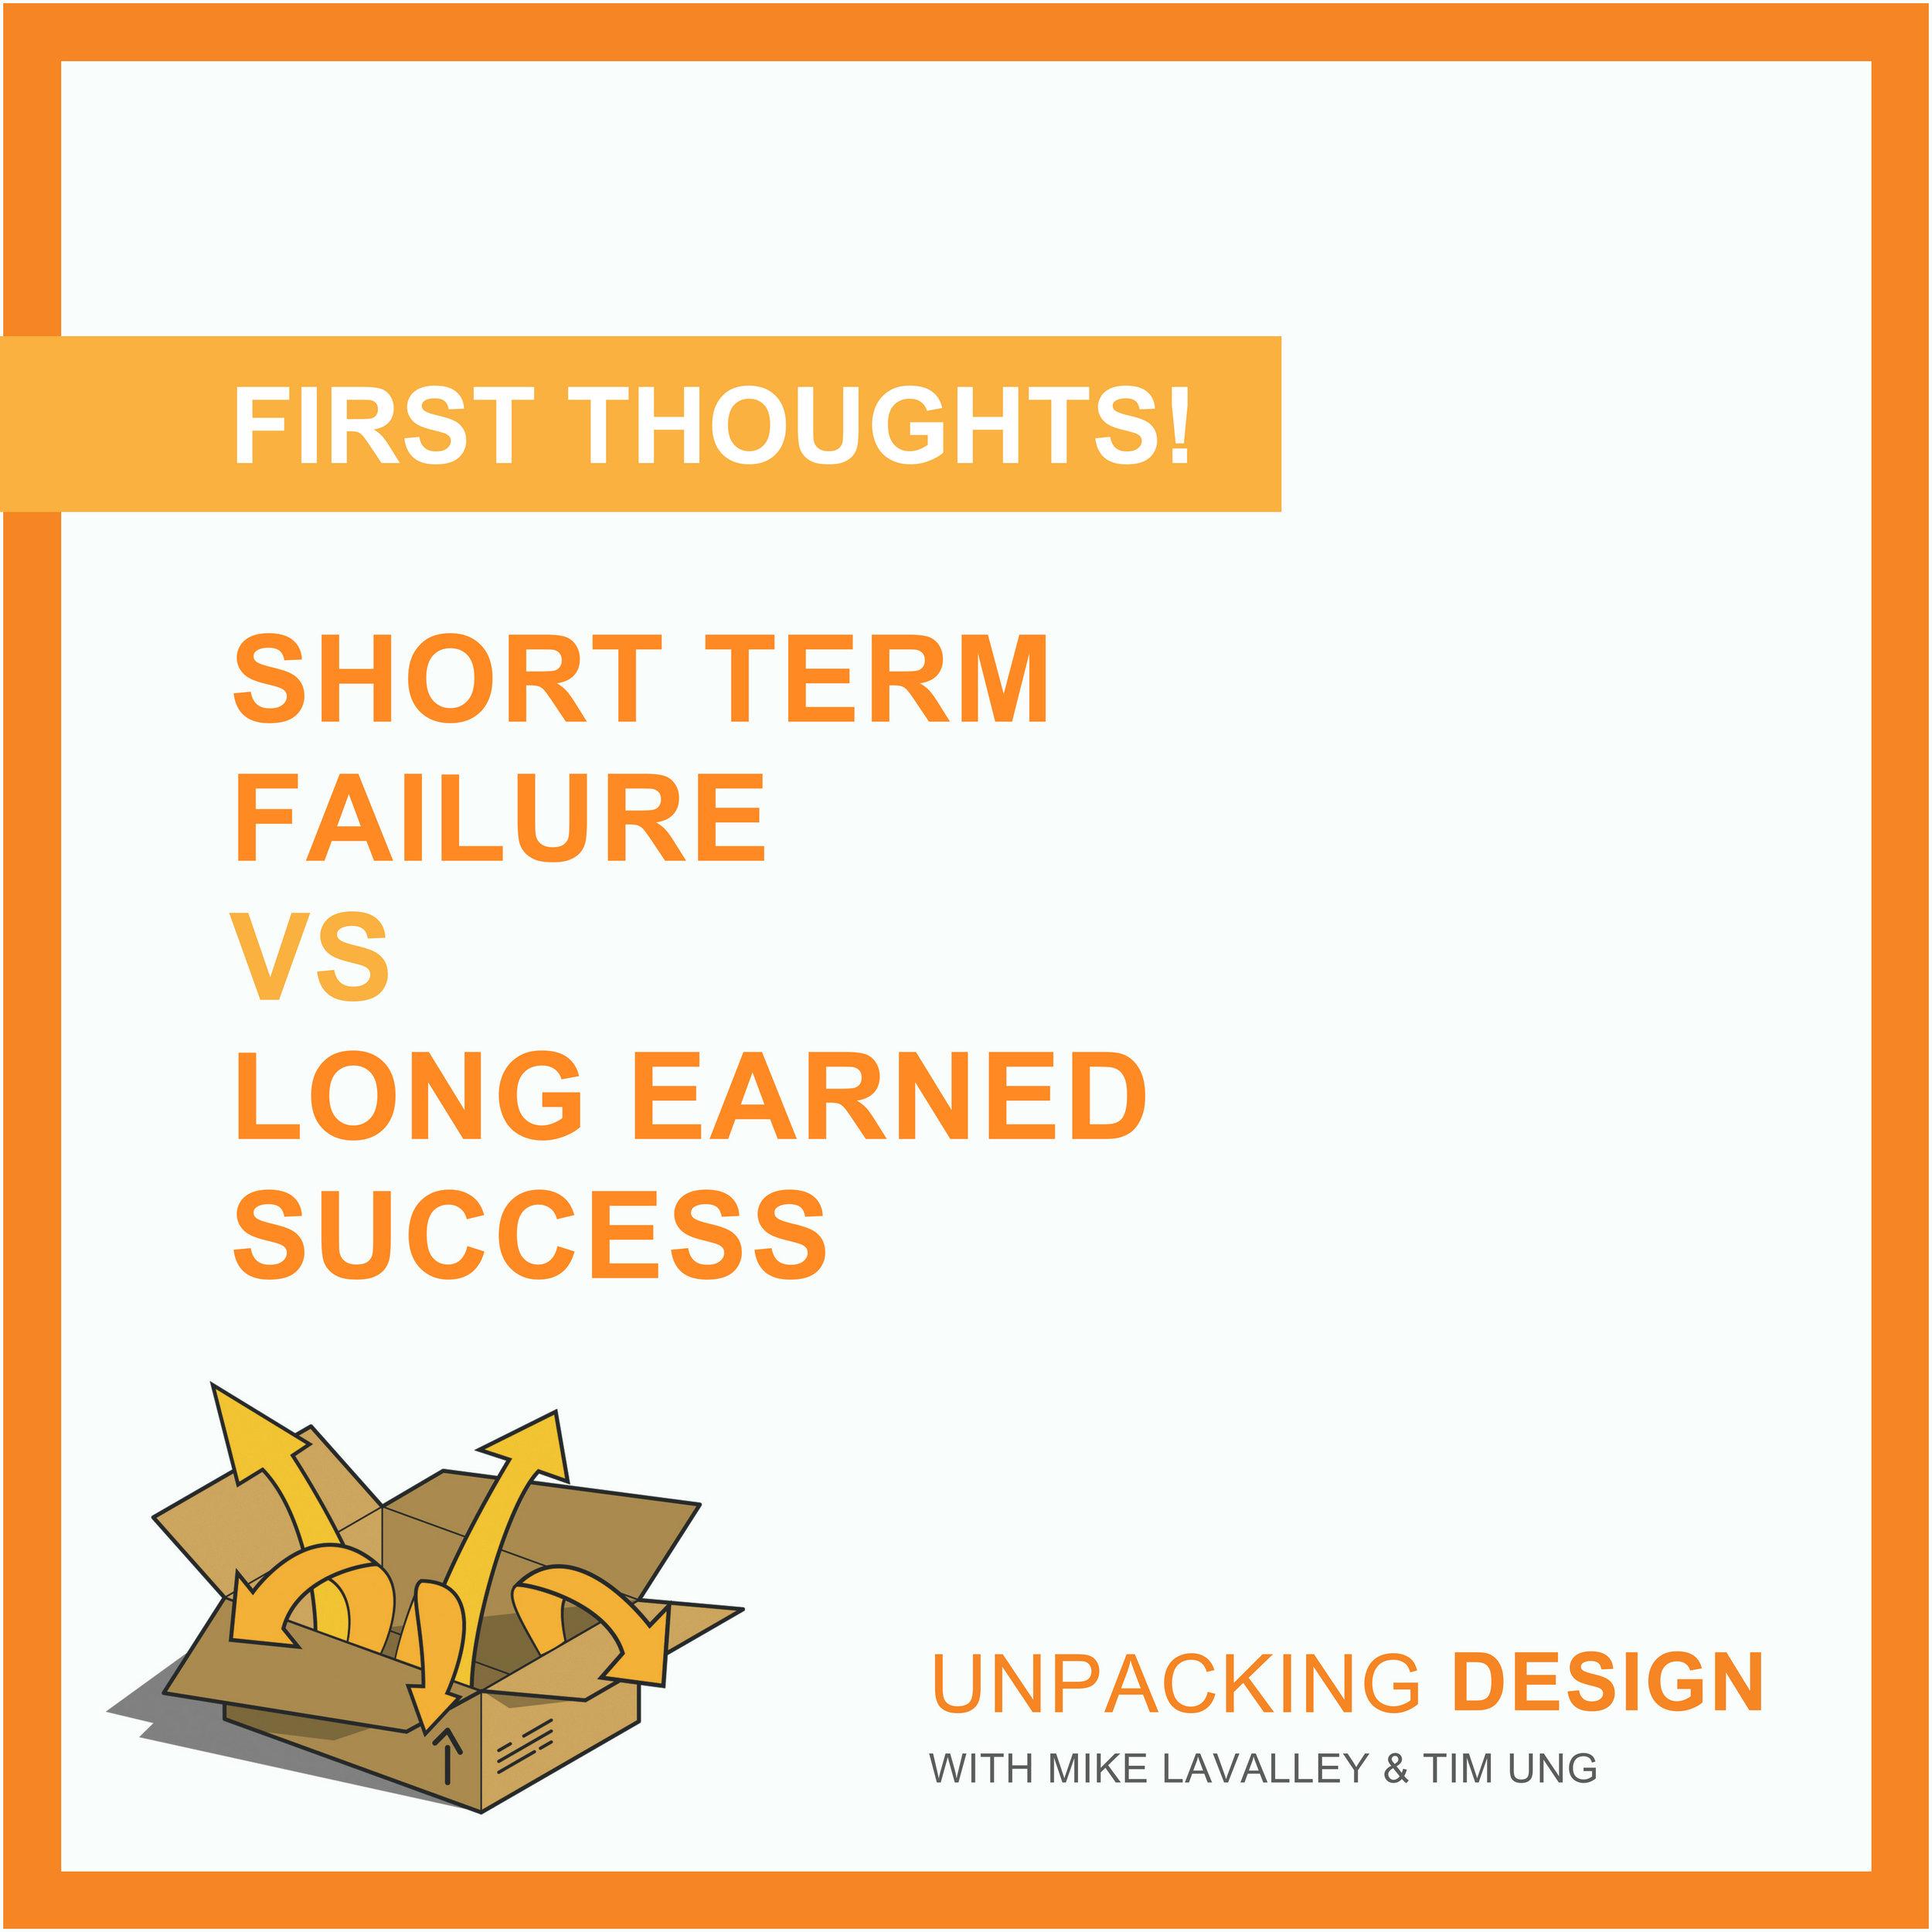 ft - episode 16 - short term failure vs long earned success.jpg